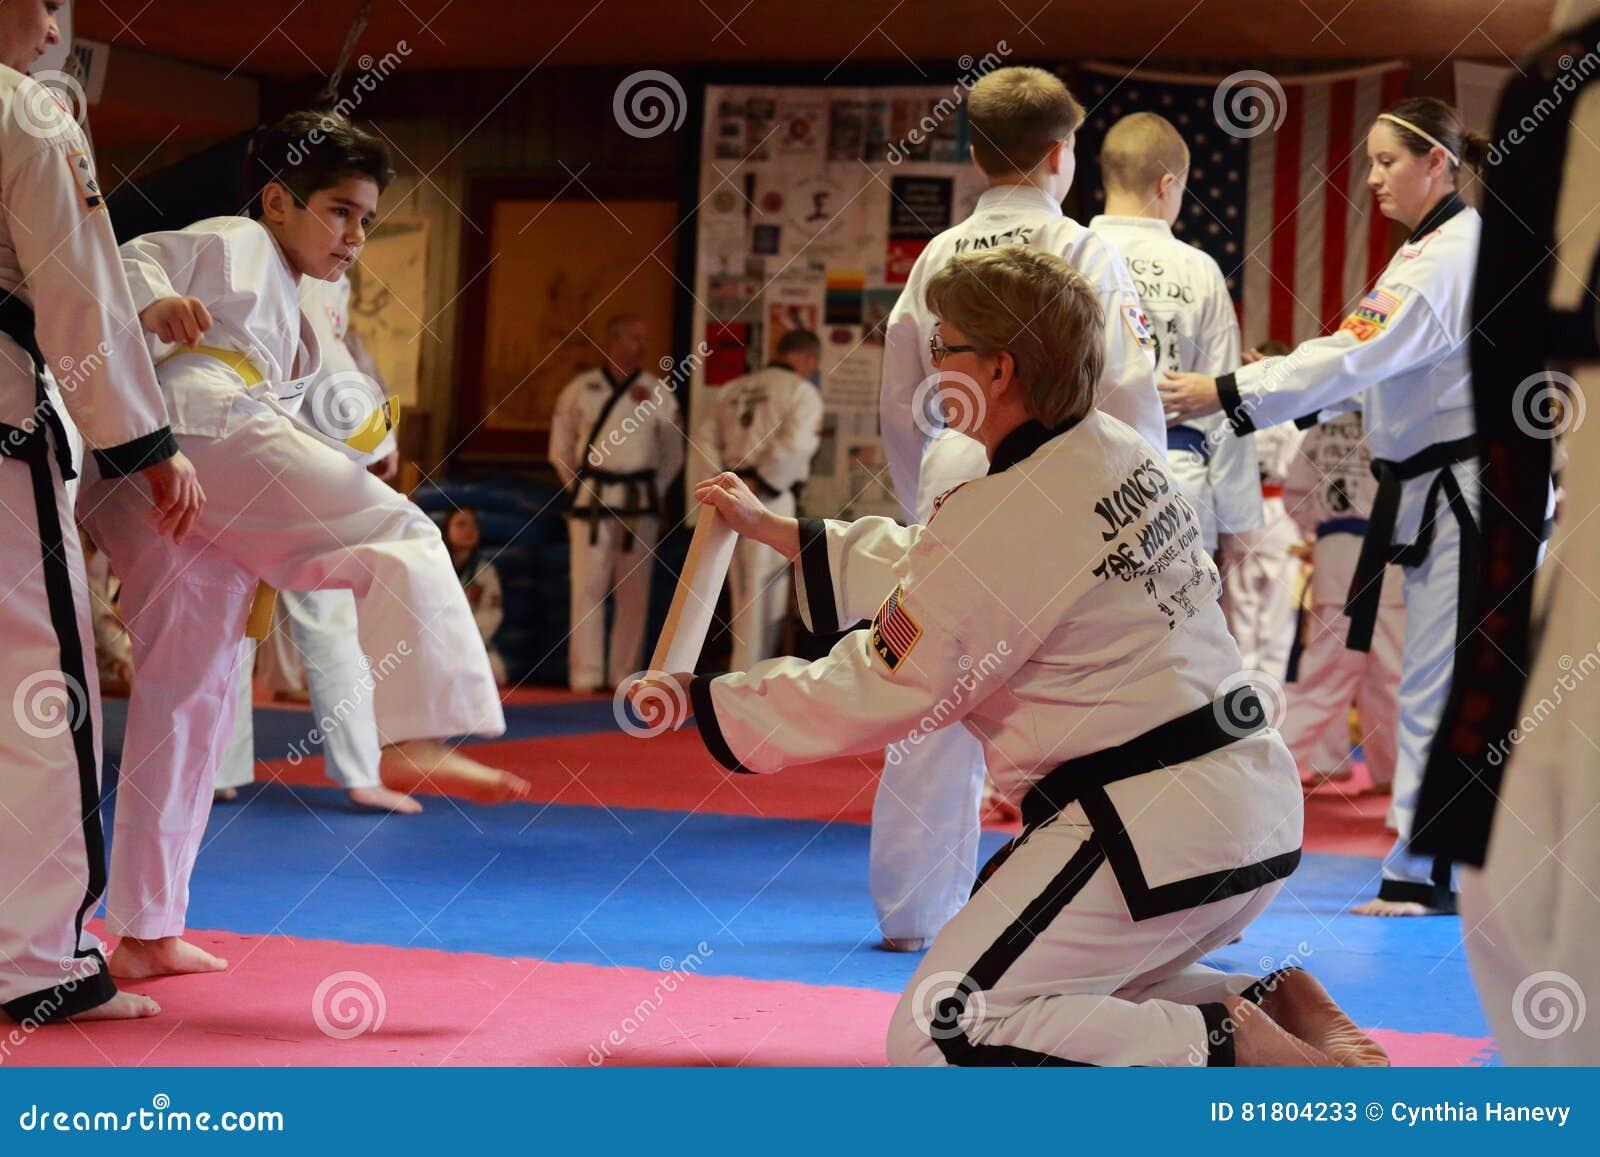 Tae Kwon Do test in Cedar Rapids, Iowa.